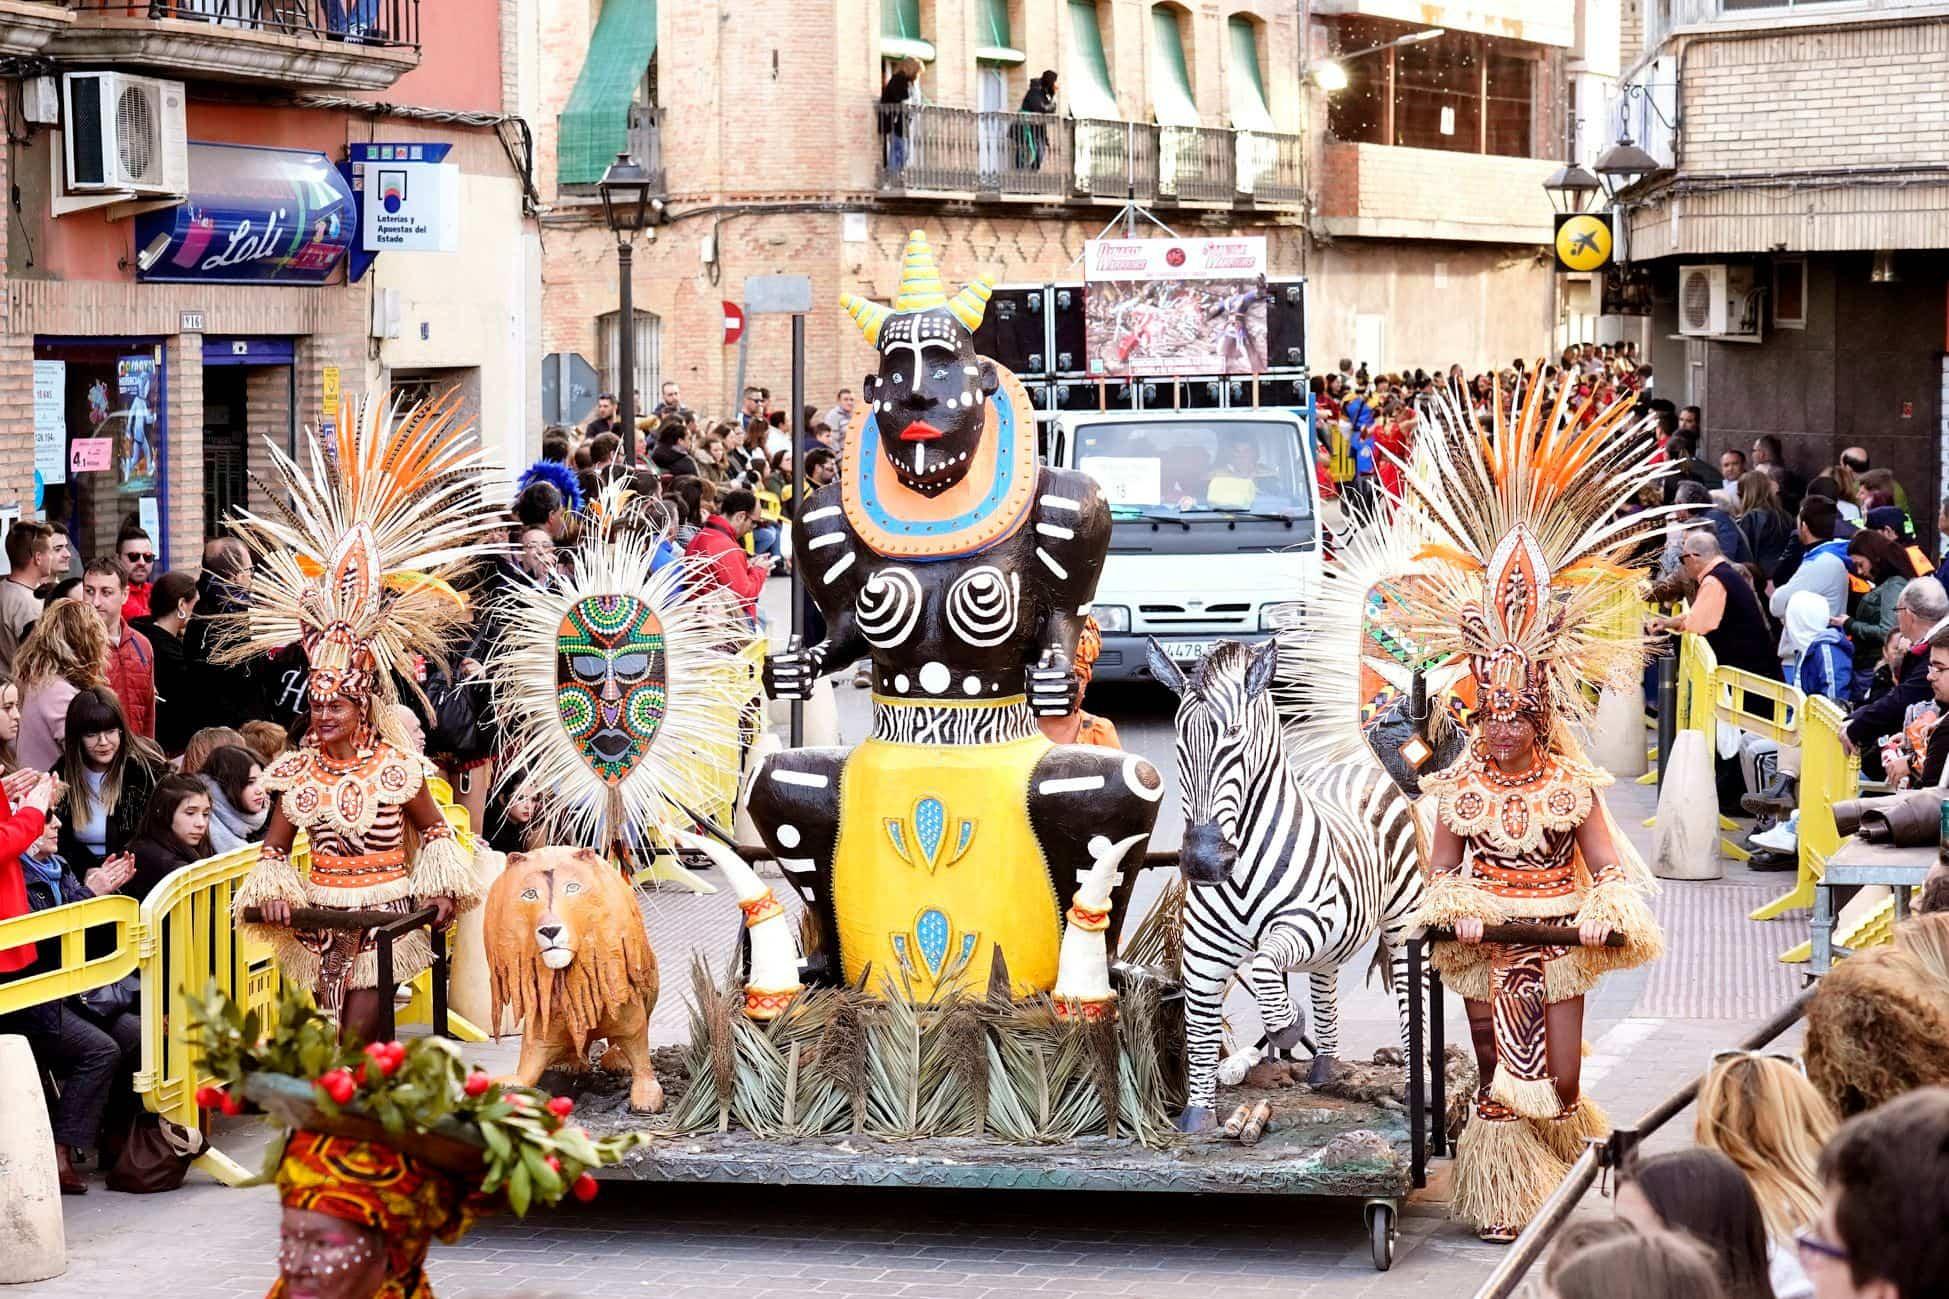 Carnaval de herencia 2020 ofertorio 77 - Selección de fotografías del Ofertorio del Carnaval de Herencia